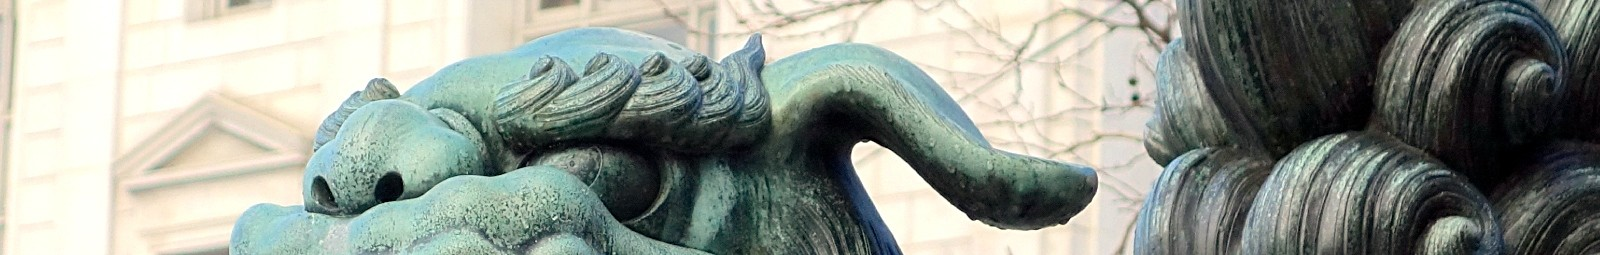 Asian Art Museum Statue